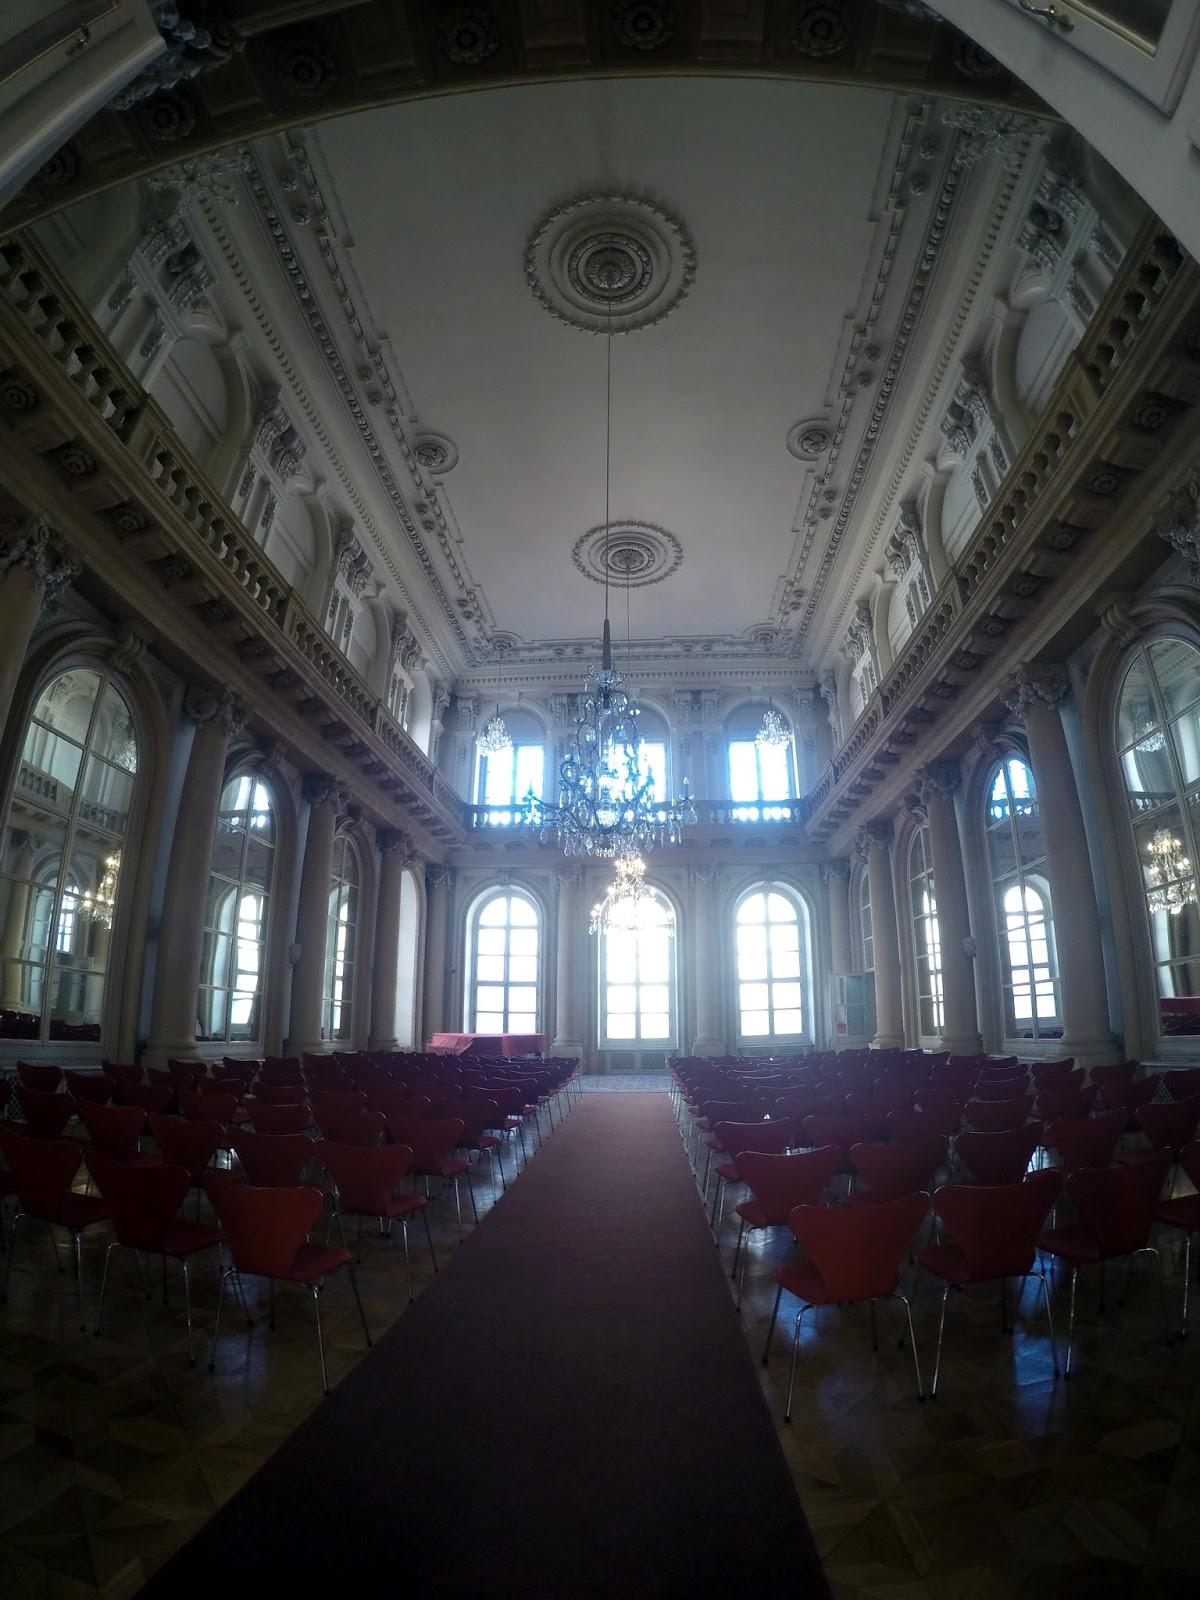 hall of mirrors, Slovakia, Bratislava, off the beaten track, eastern europe, eu, historical city, on the danube, ufo, bridge, communist